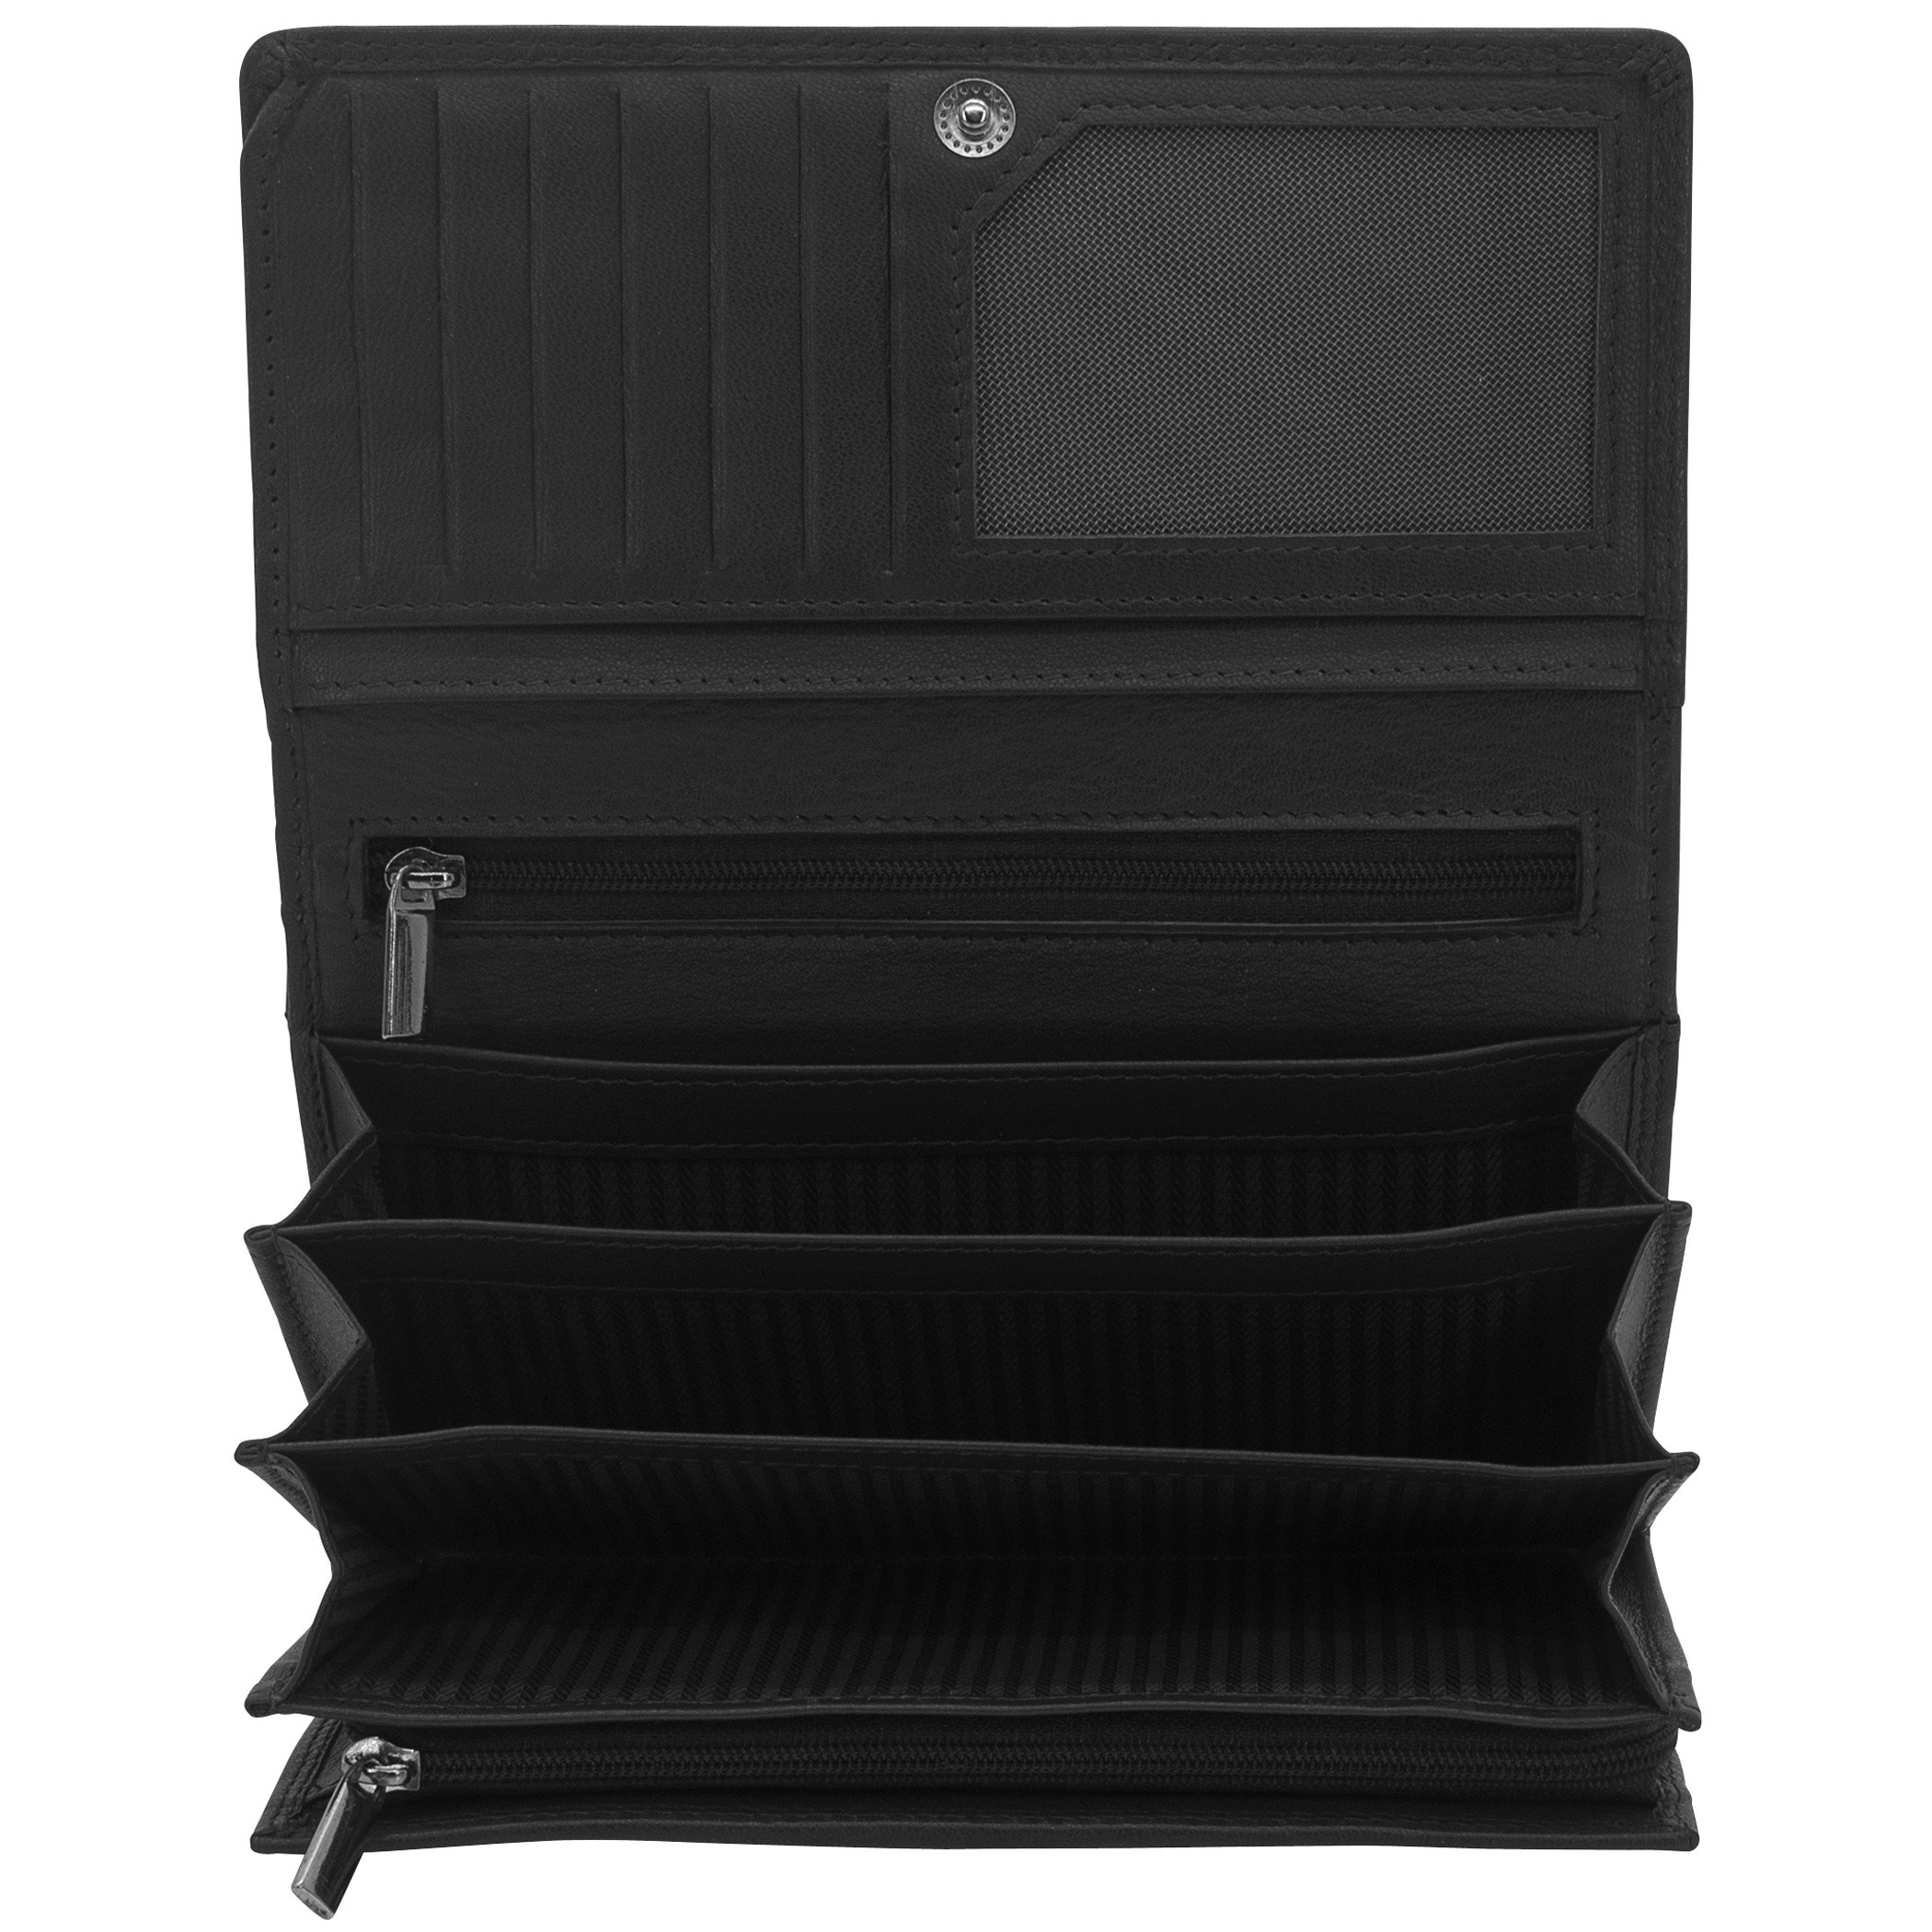 Geldbörse MANDALA Nappa Leder schwarz RFID Schutz